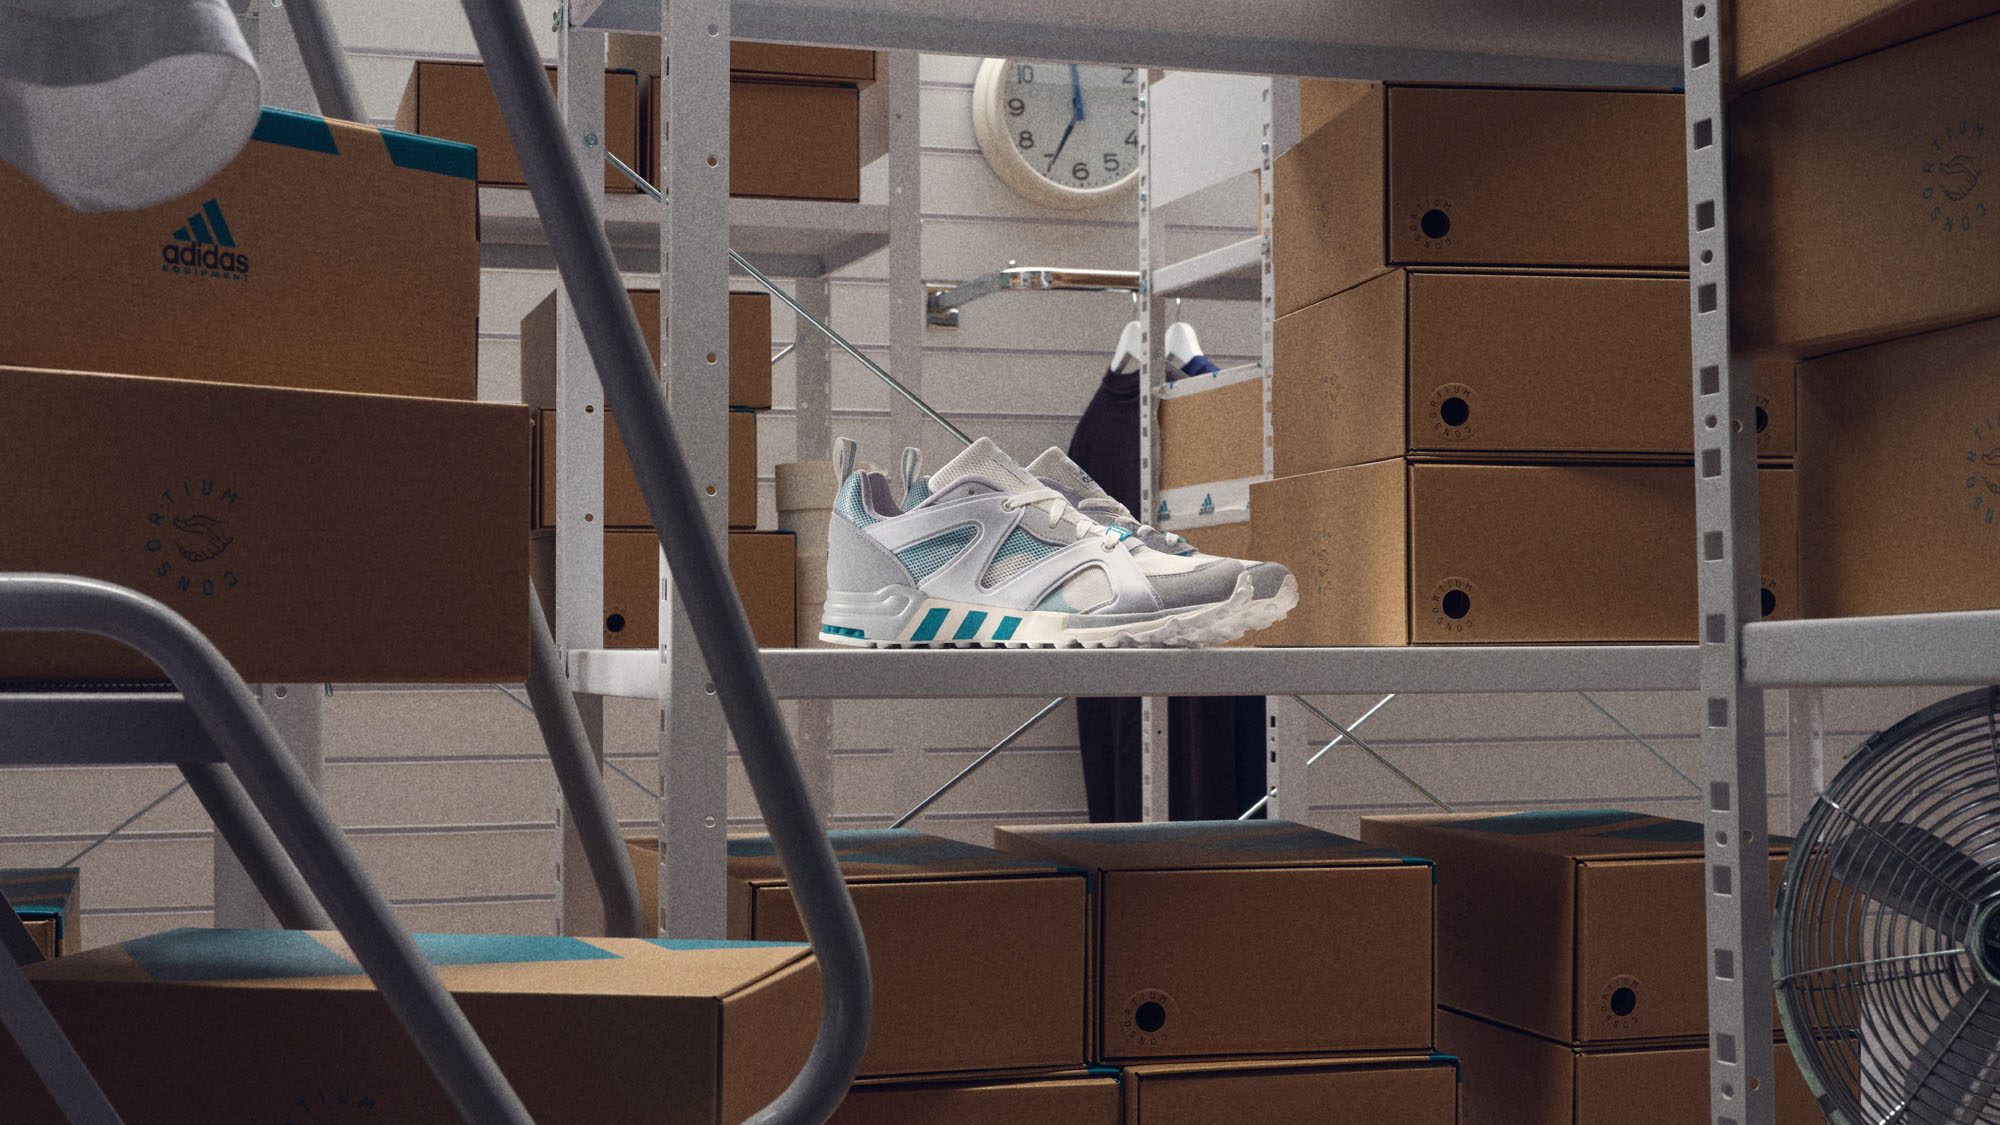 adidas EQT Equipment Prototype OG